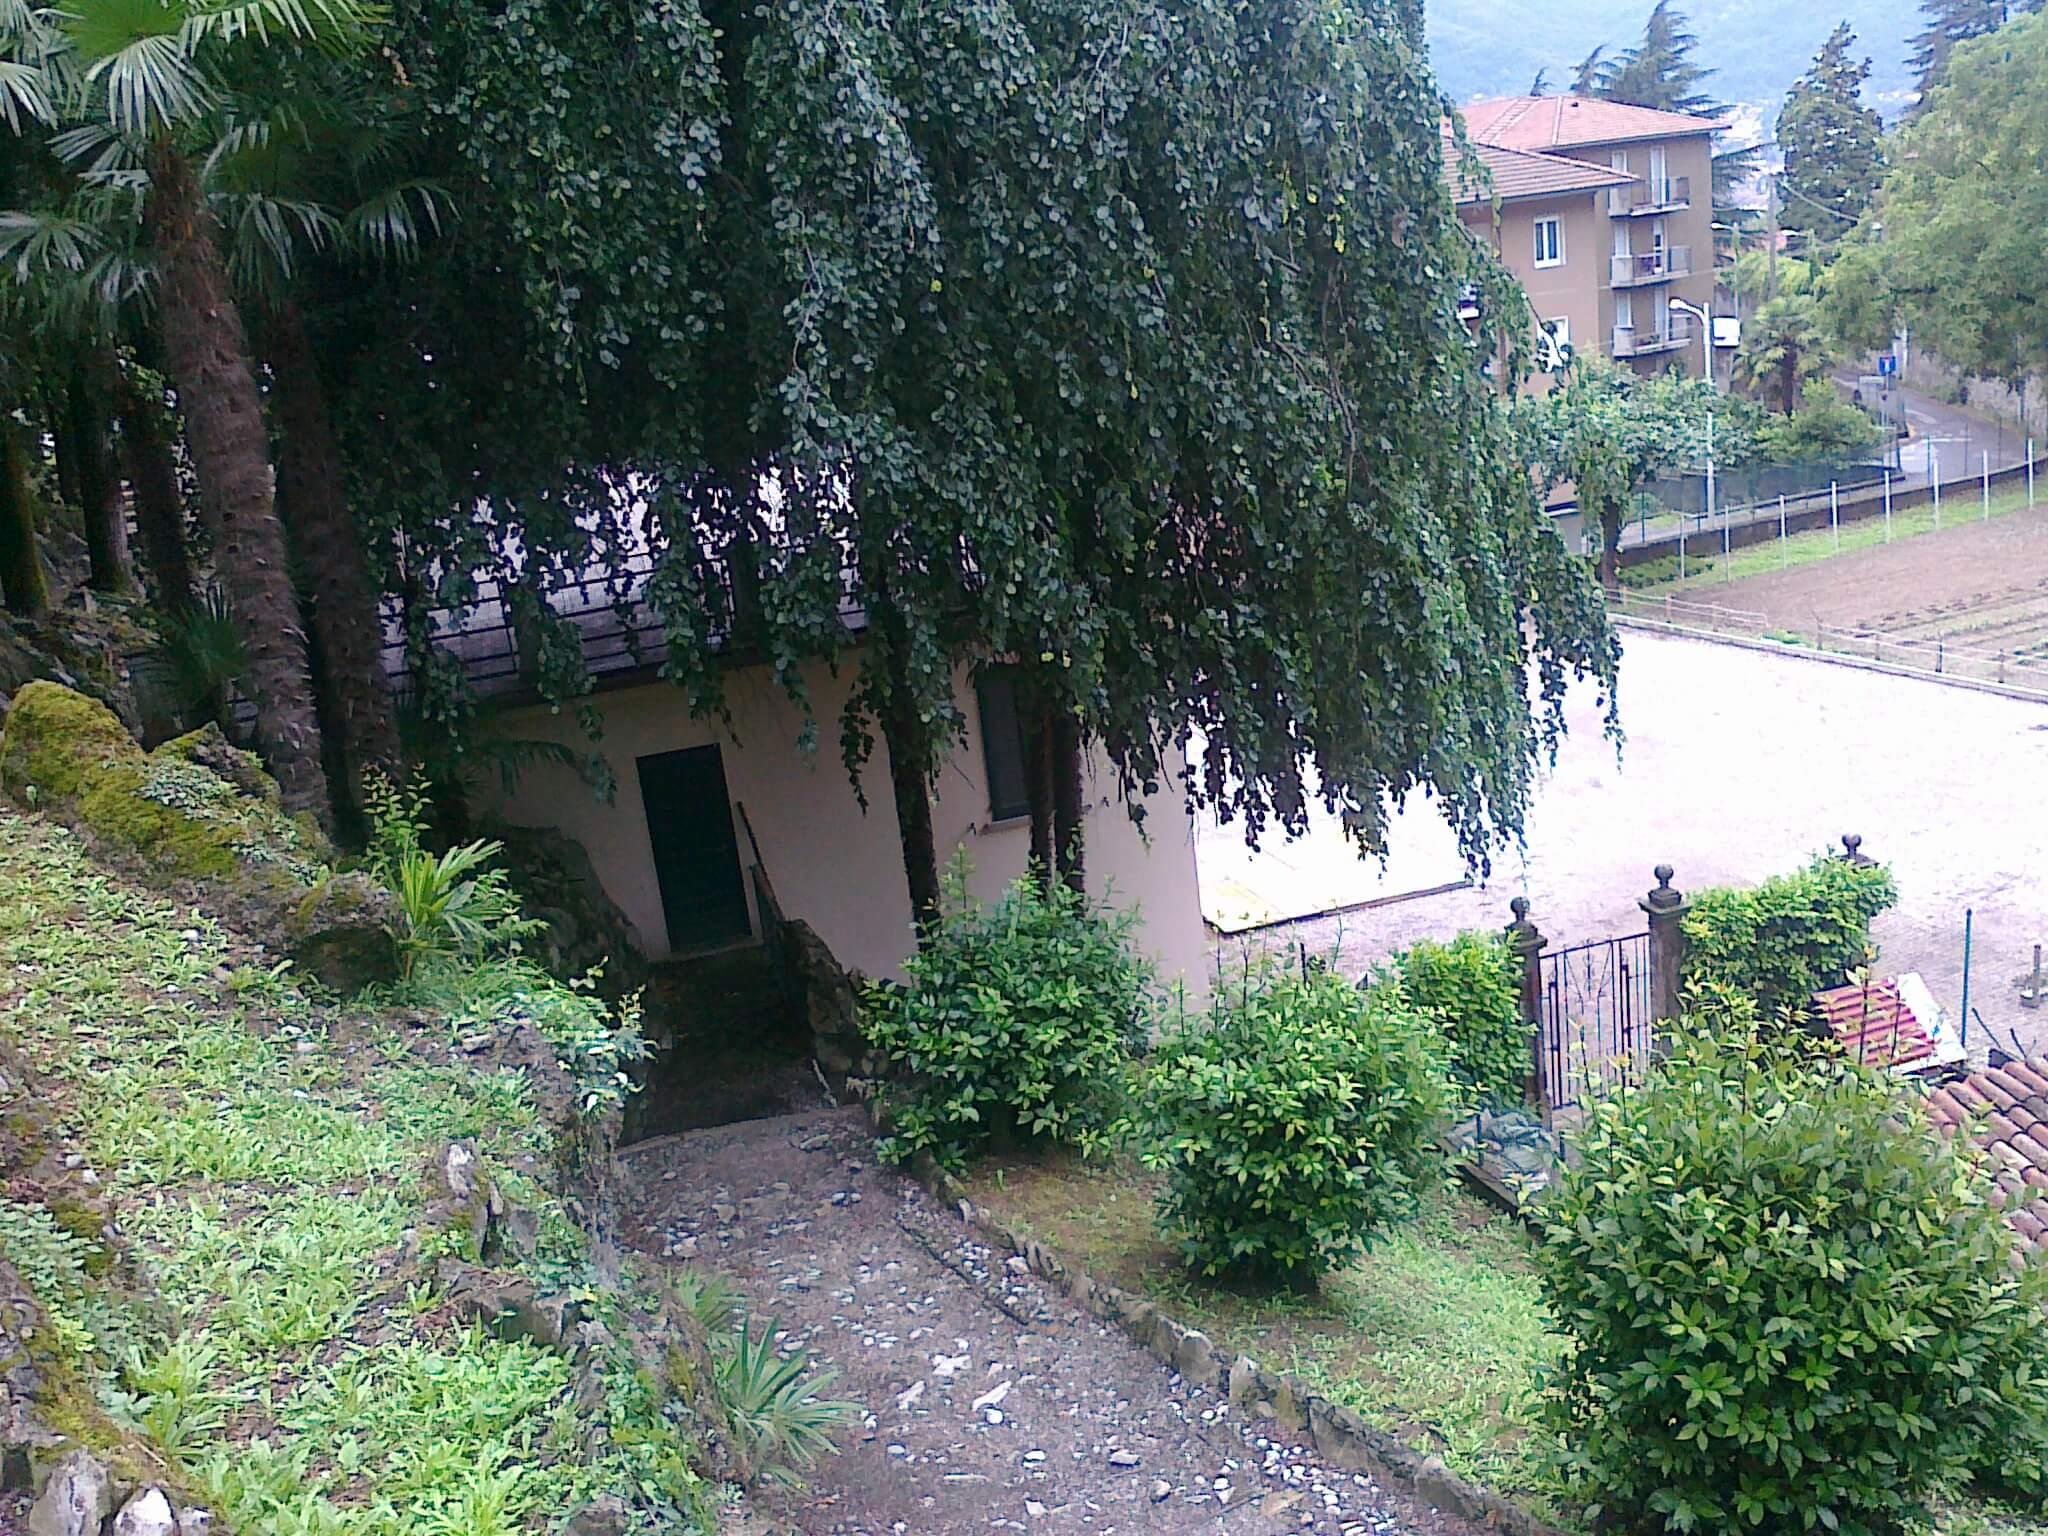 Calolzio 08.06.11 (2)